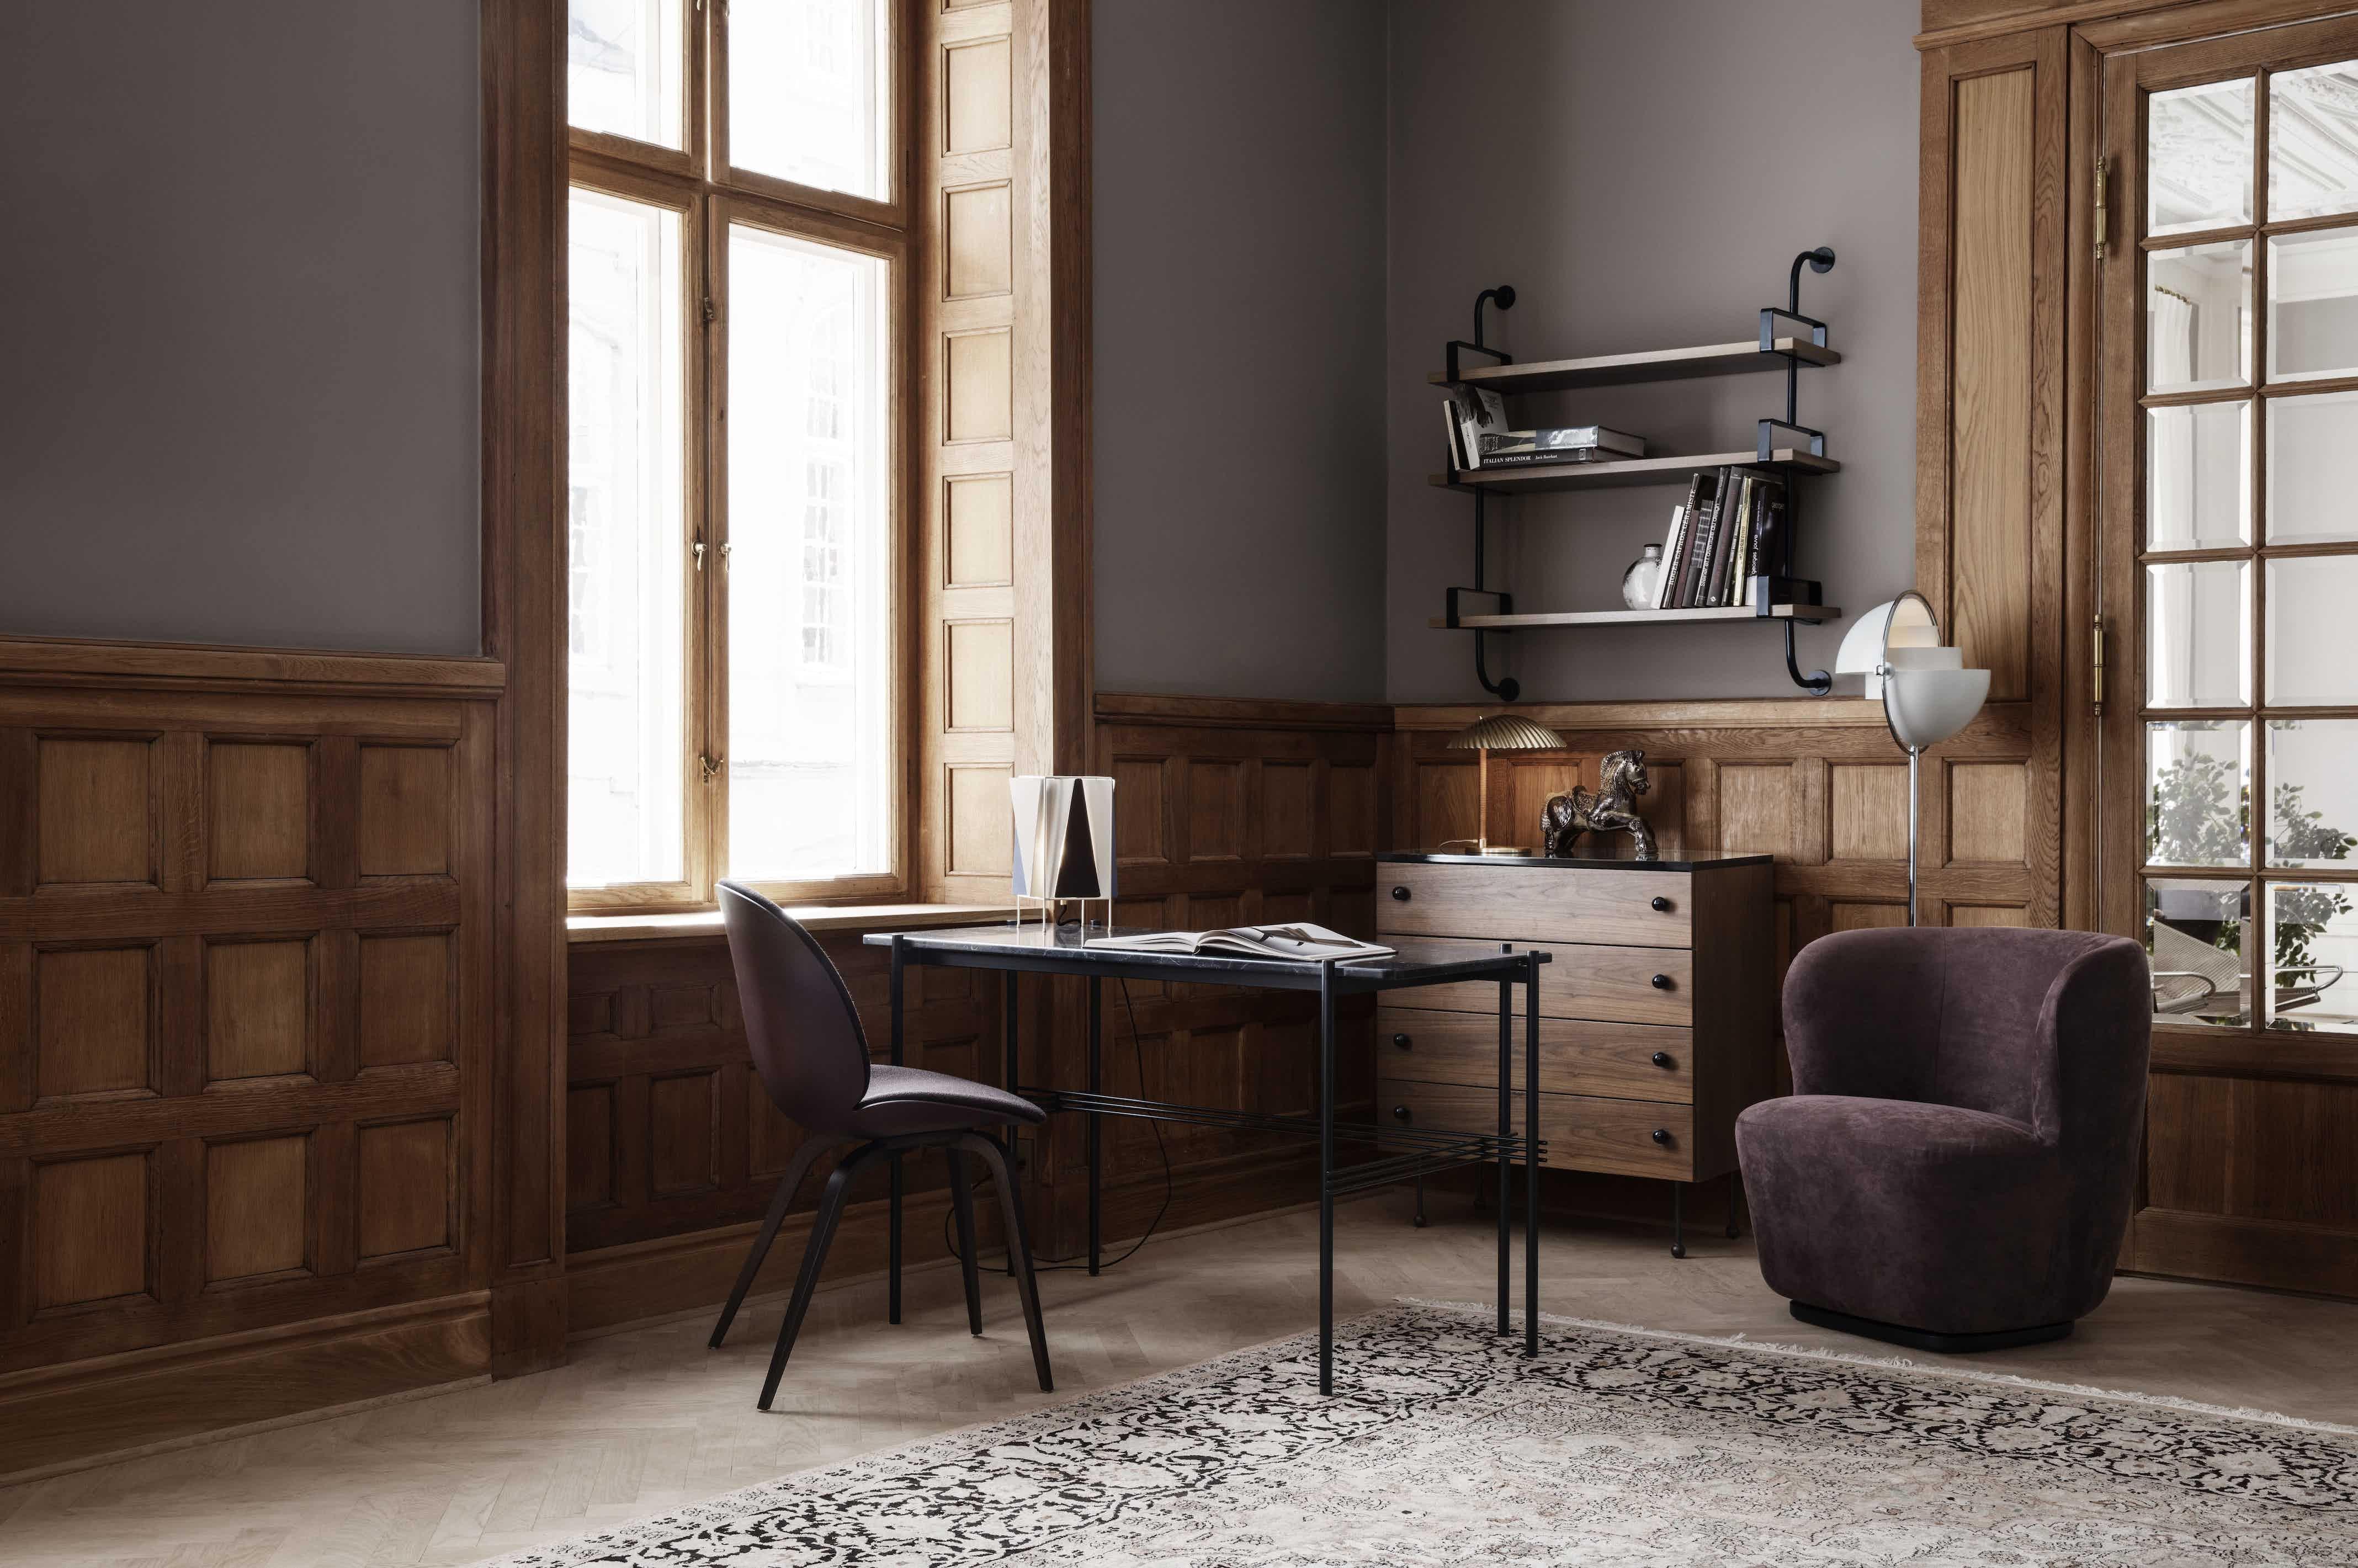 Gubi-62-desk-insitu-angle-haute-living